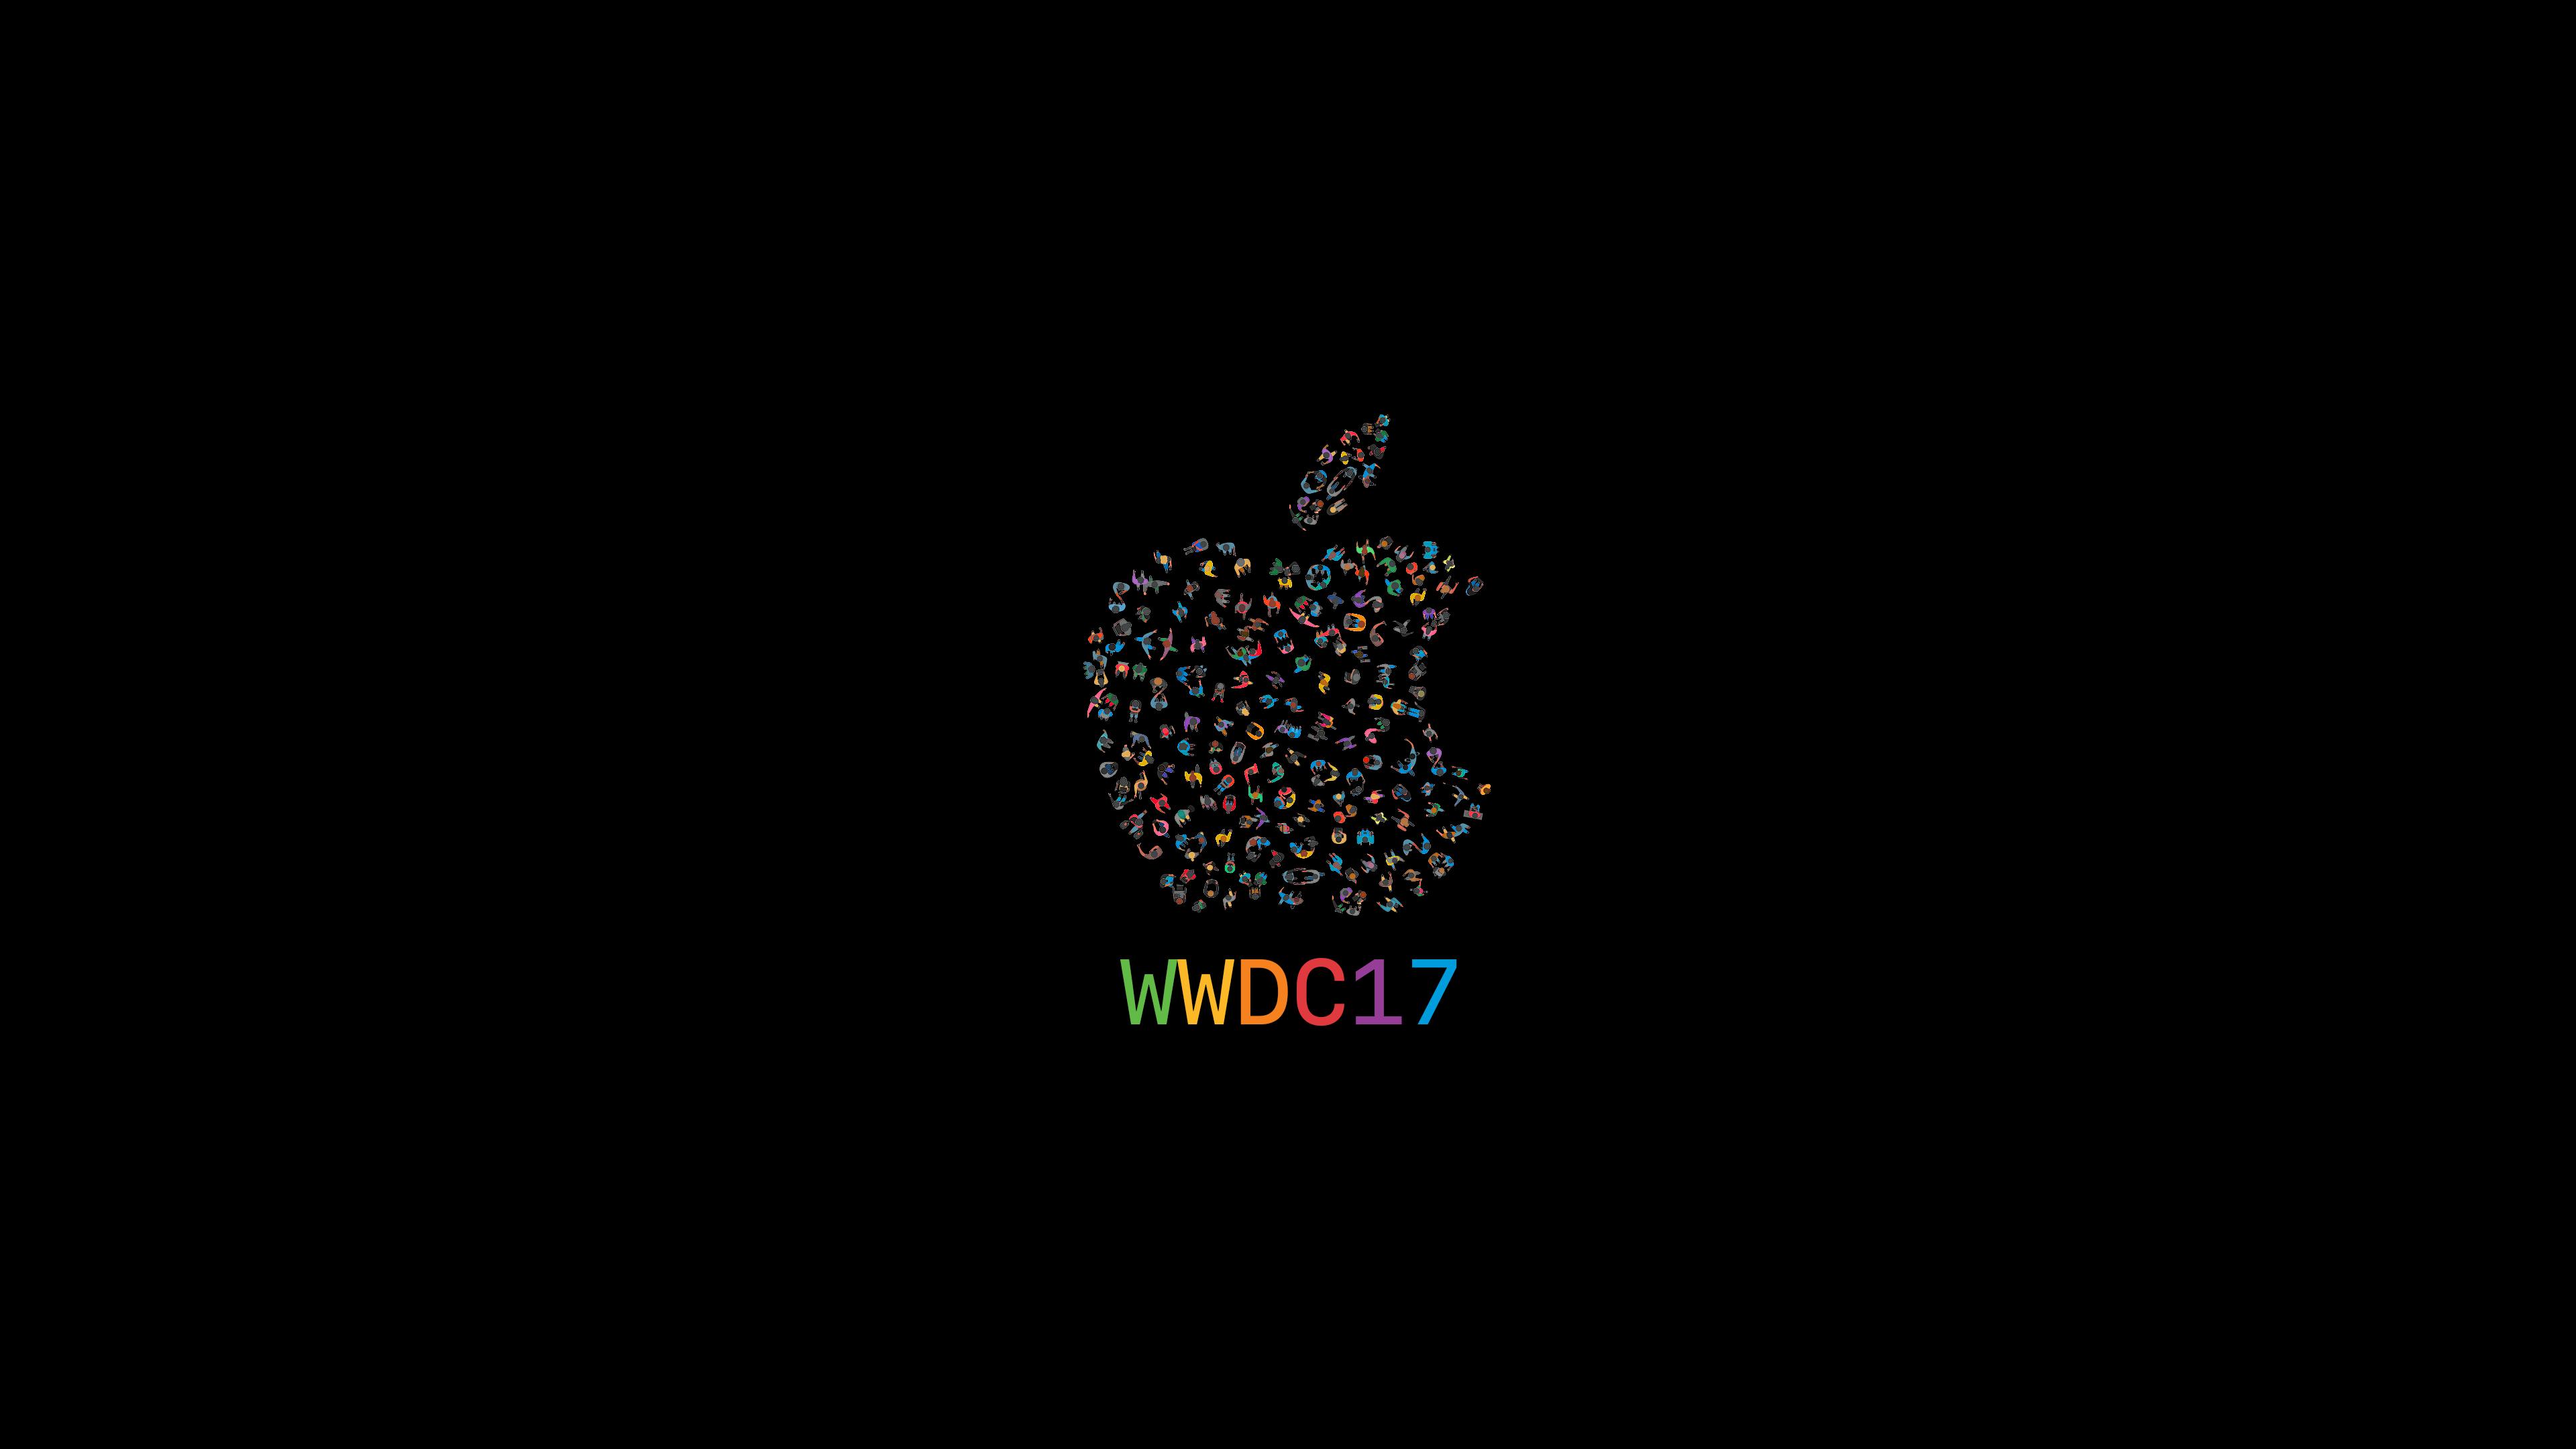 Wwdc 2017 wallpapers for Imagenes para fondo de pantalla para laptop